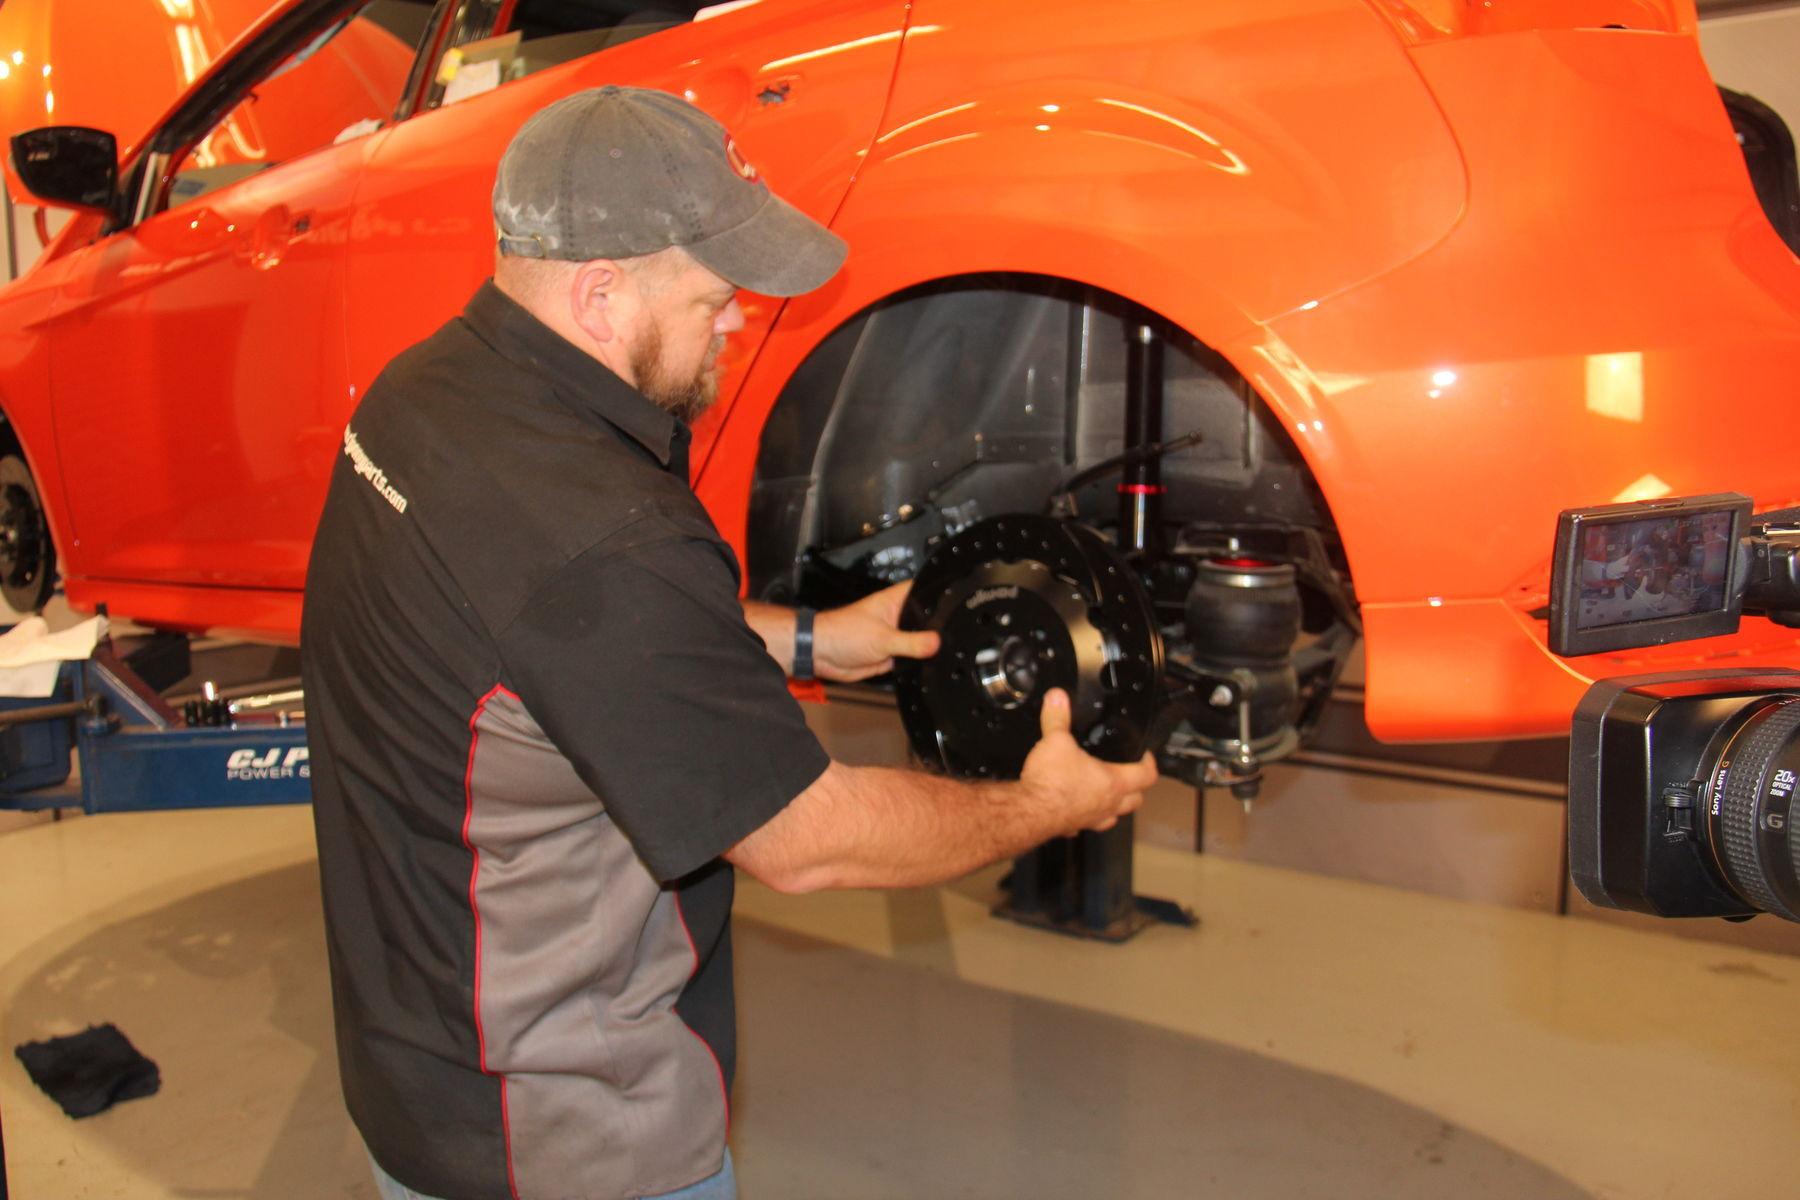 2015 Ford Focus ST | CJ Pony Parts Focus ST - Wilwood Brakes Install